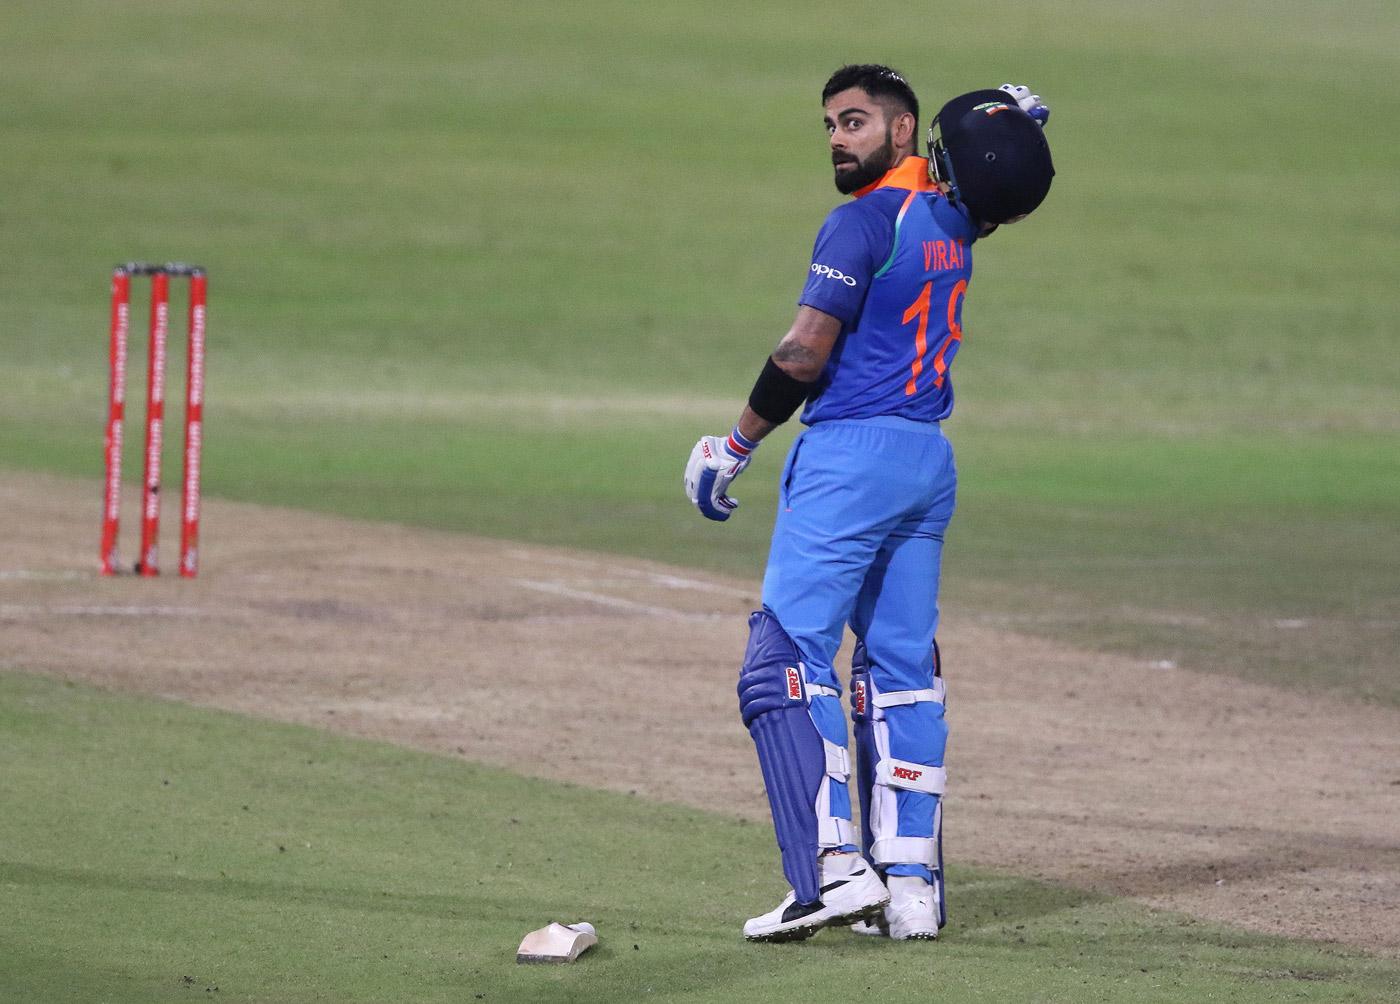 SA vs IND 2018: Red-Hot Virat Kohli Equals Sourav Ganguly's Record